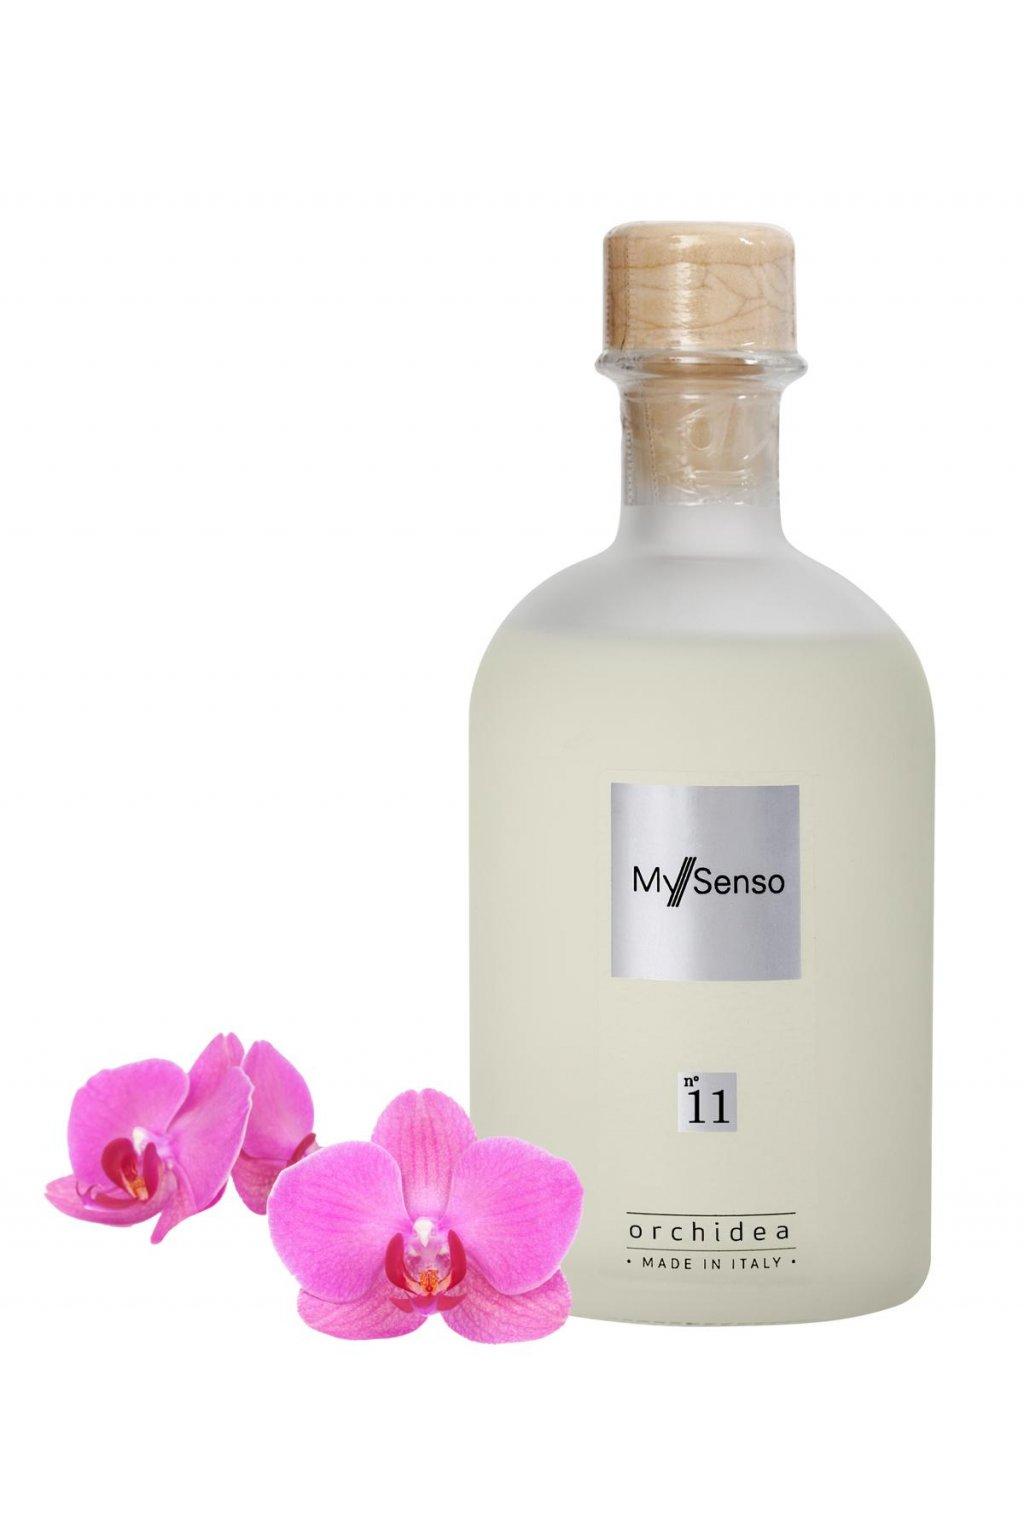 168 my senso nahradni napln pro aromaticky difuzer n 11 orchidea orchidej 240ml